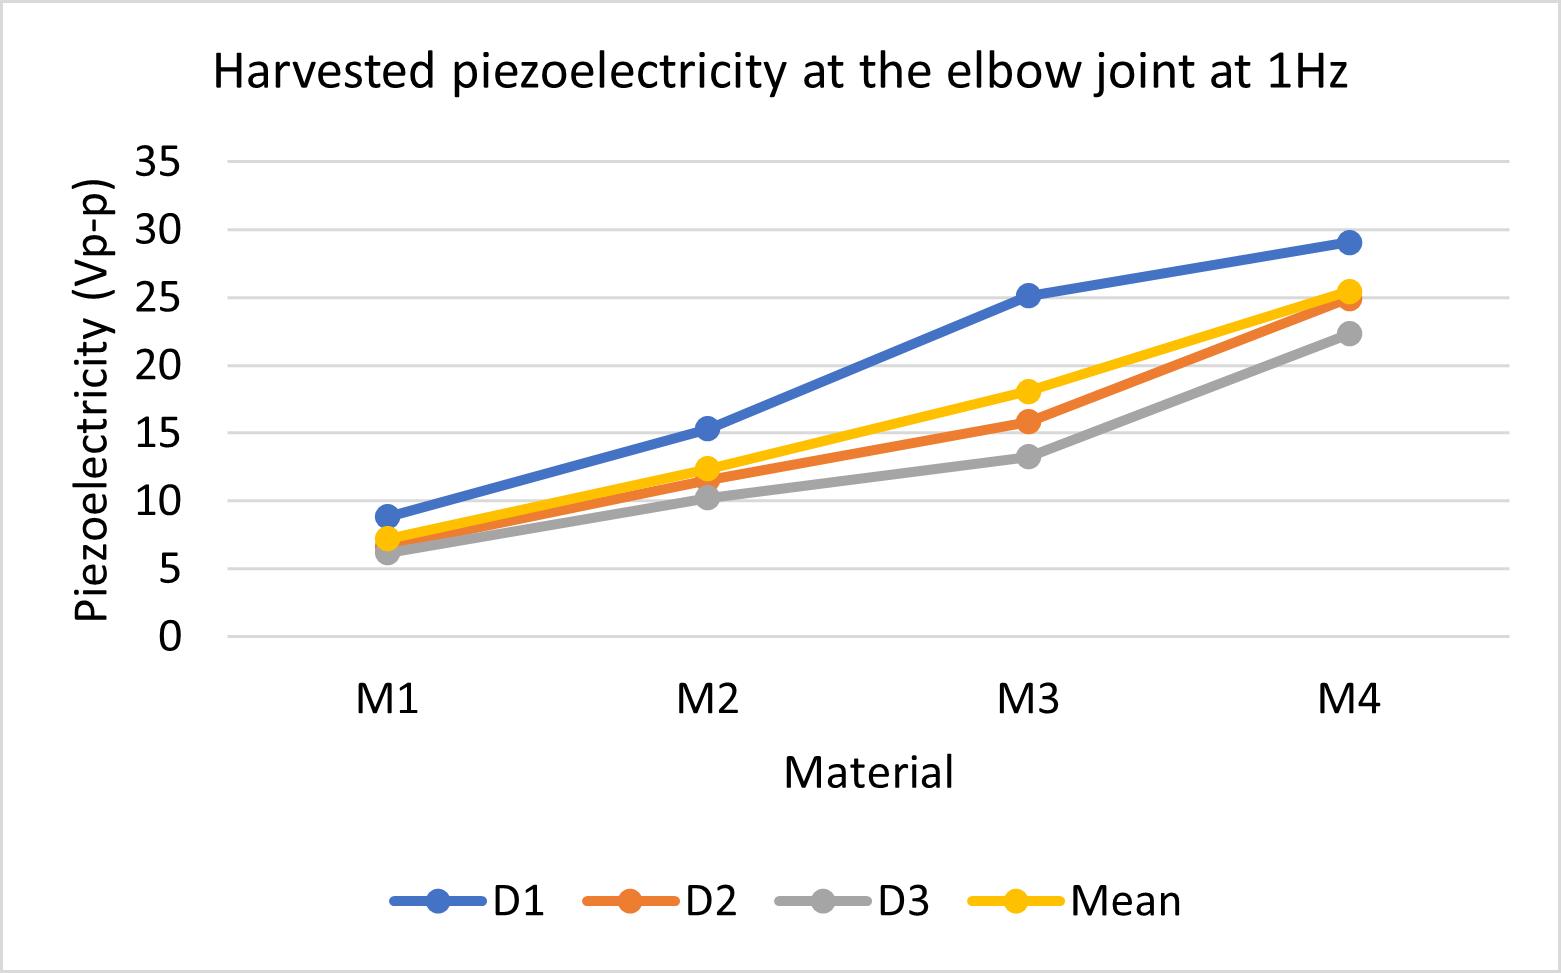 harvested-piezoelectricity-at-elbow-1-hz